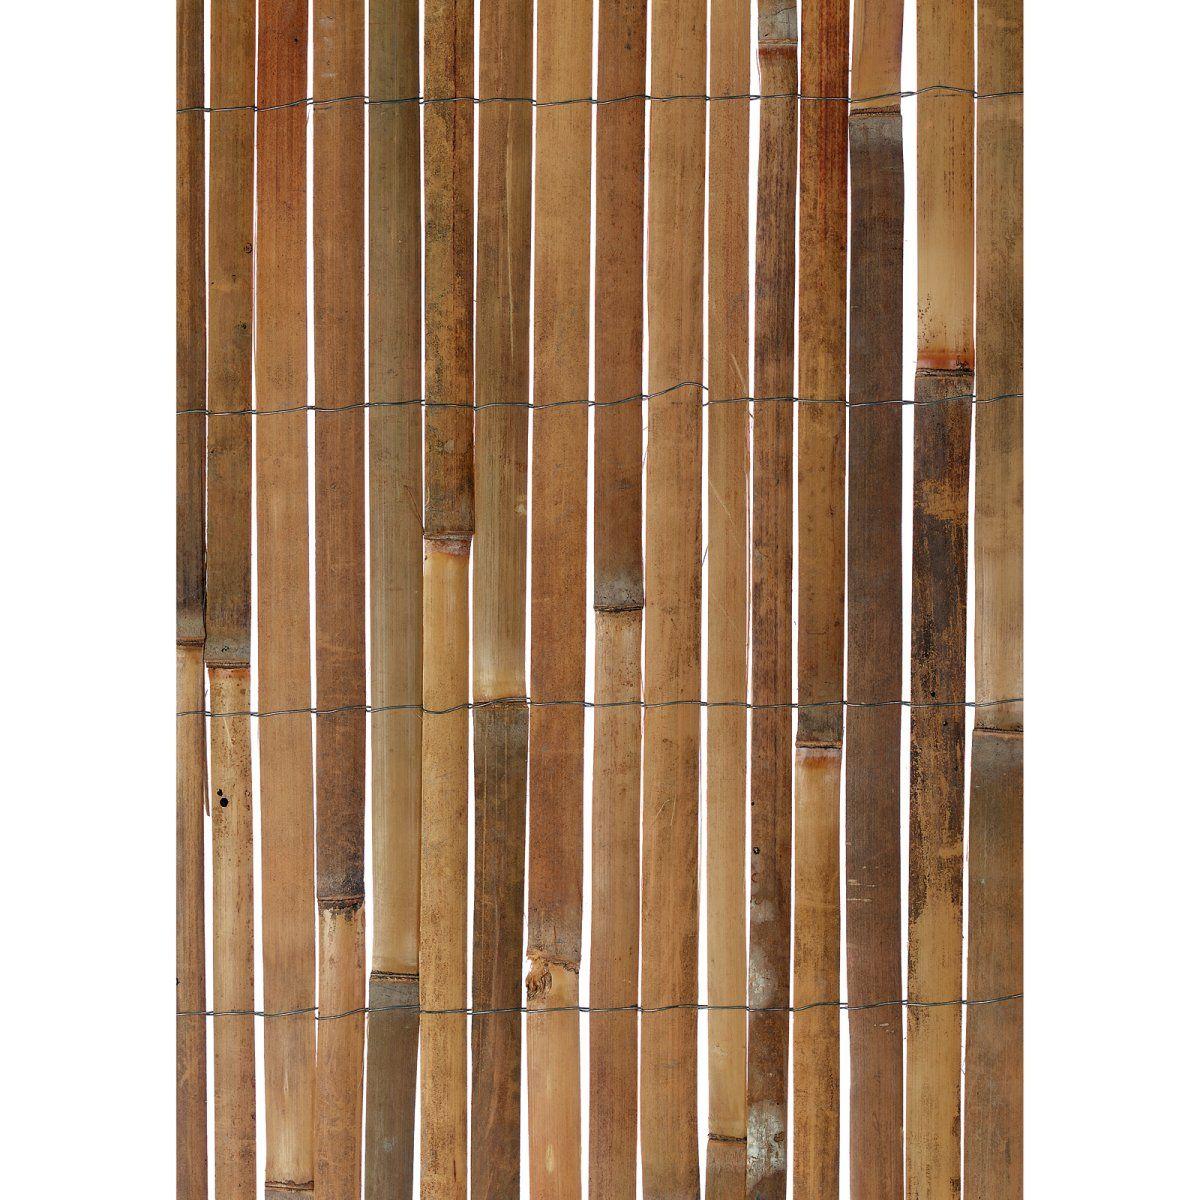 Gardman Split Bamboo Privacy Panel Fencing Manualidades